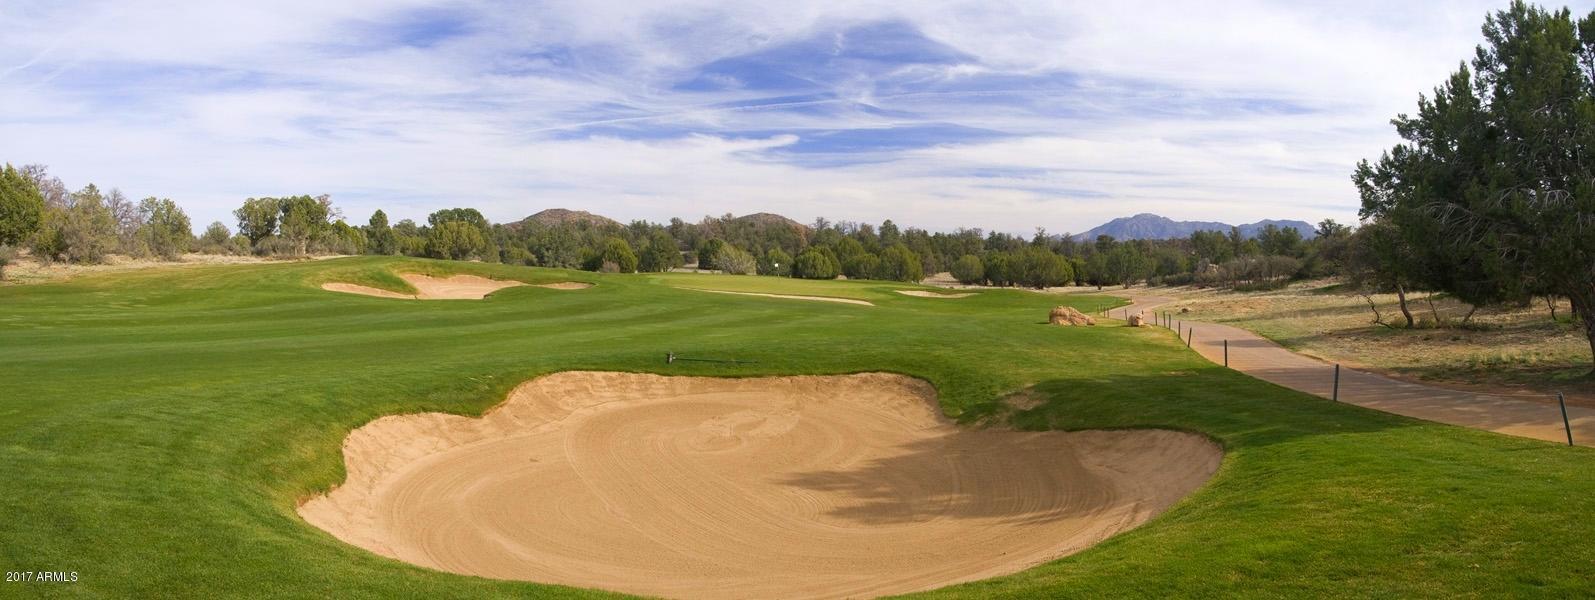 MLS 5601138 5185 W THREE FORKS Road, Prescott, AZ Prescott AZ Luxury